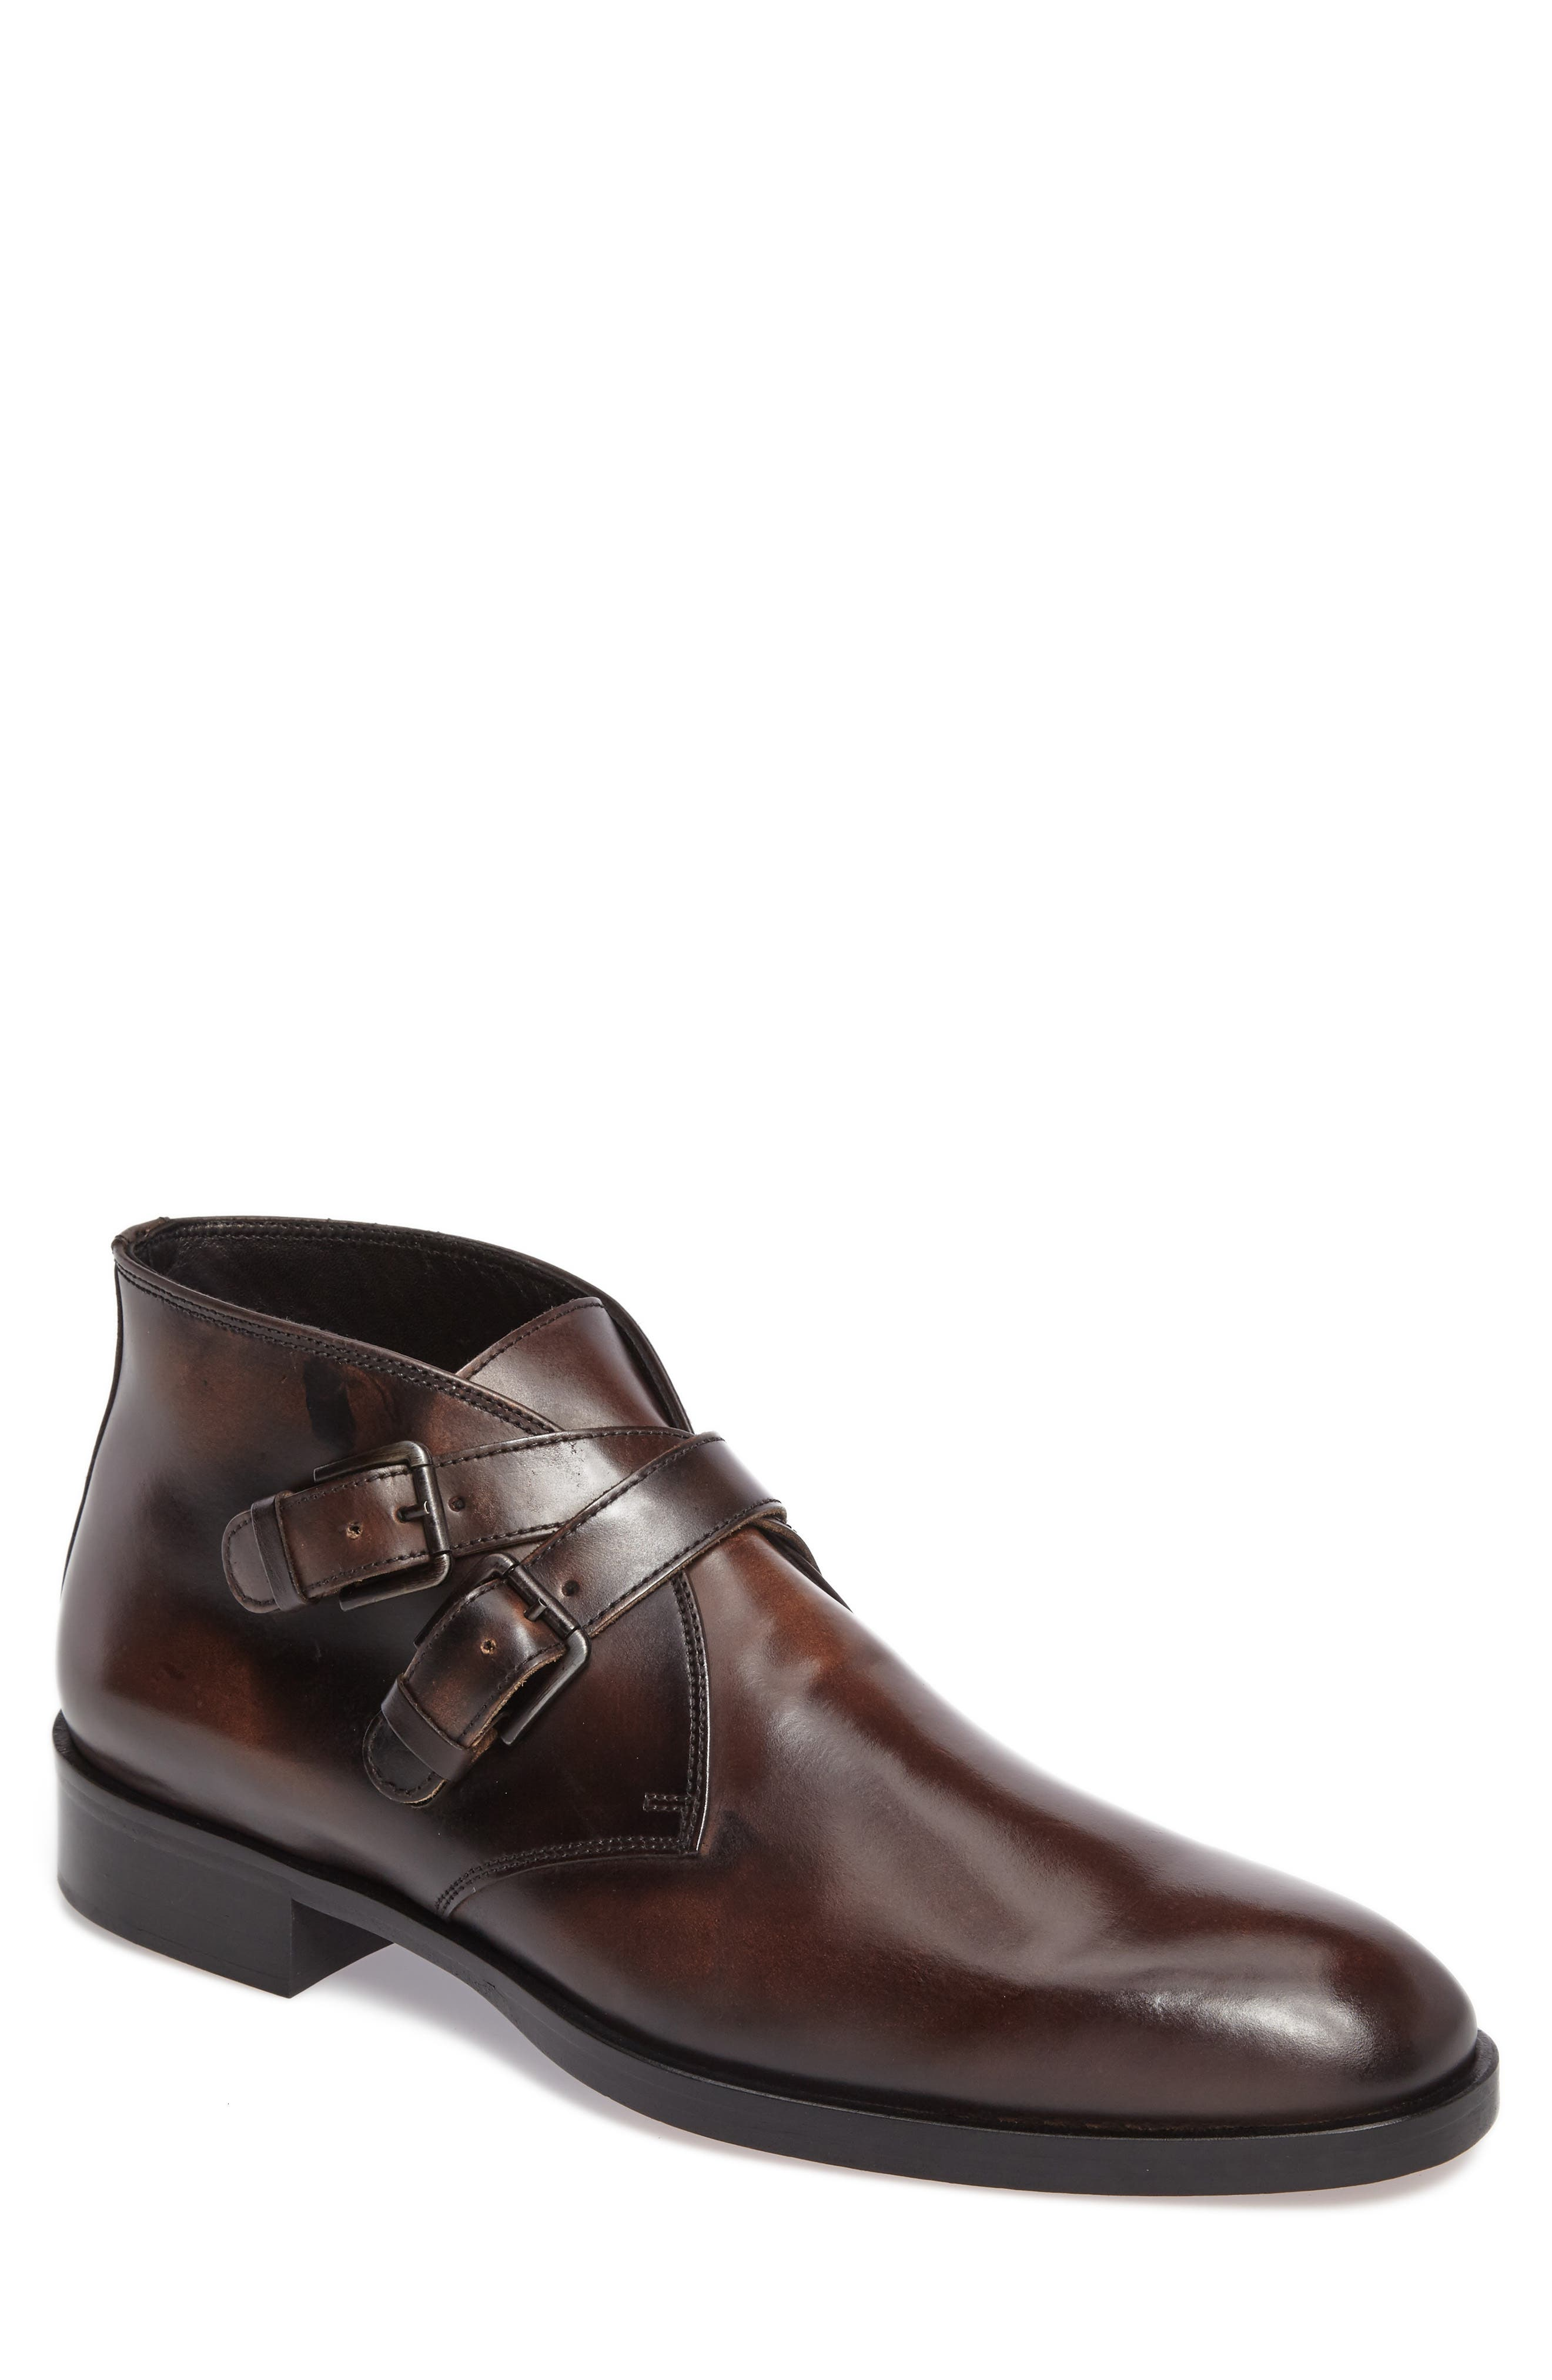 Donald J Pliner Zigor Double Monk Strap Boot,                         Main,                         color, 200